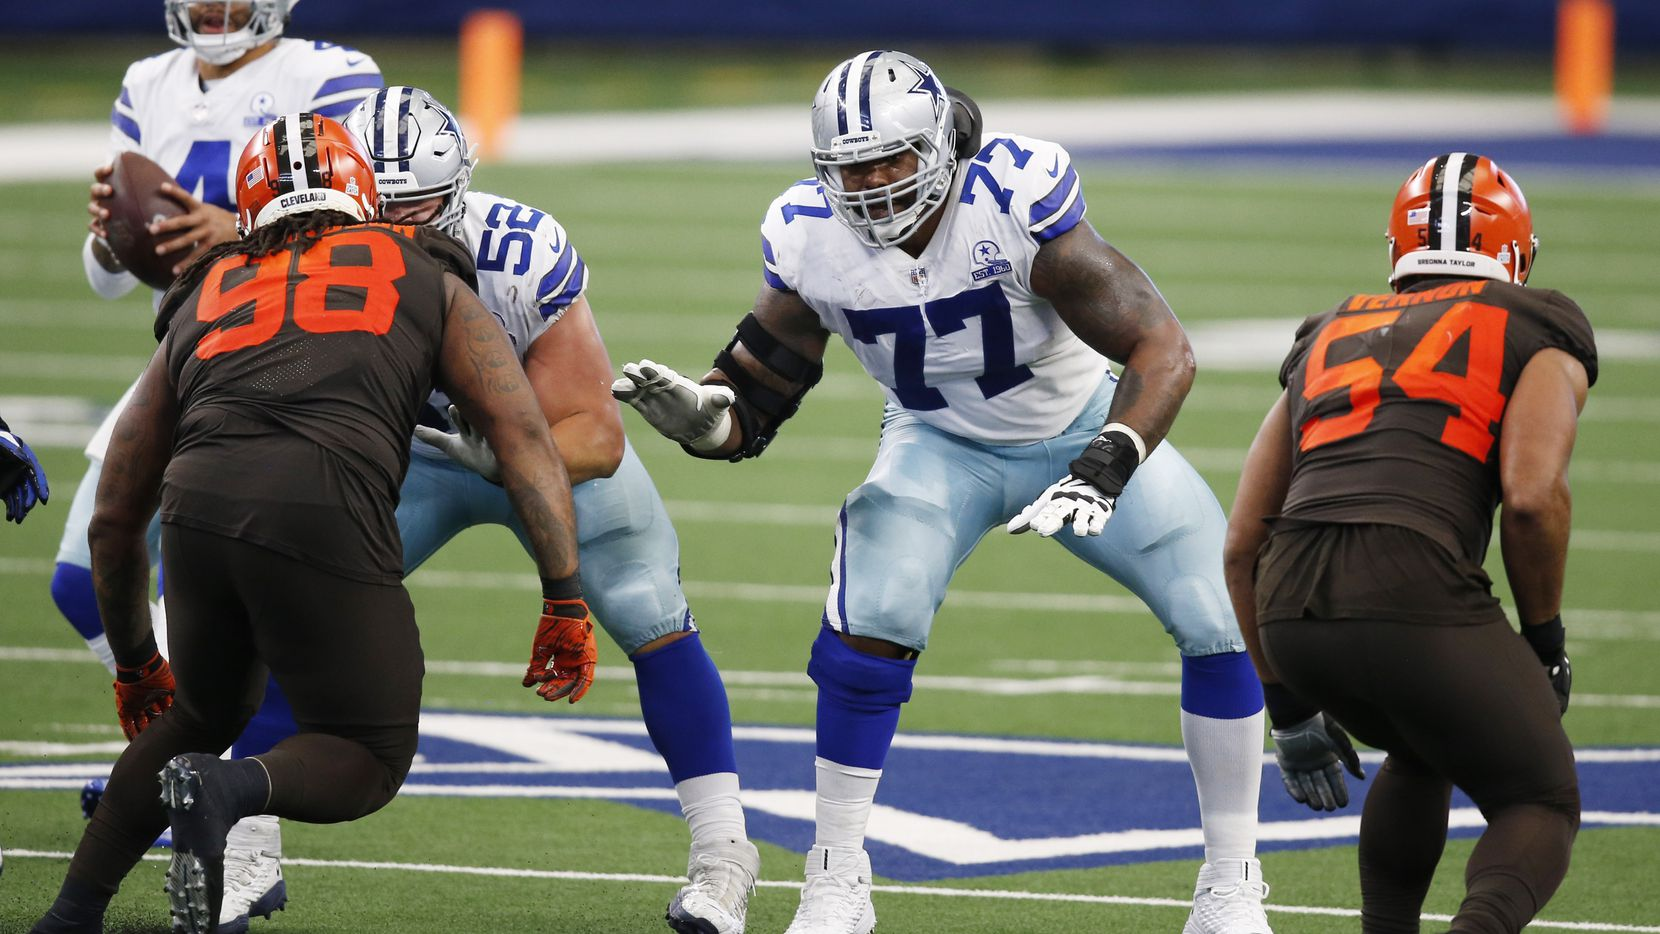 Dallas Cowboys offensive tackle Tyron Smith (77) and Dallas Cowboys offensive guard Connor Williams (52) prepare to block as Dallas Cowboys quarterback Dak Prescott (4) drops back during the second half of play at AT&T Stadium in Arlington, Texas on Saturday, October 4, 2020.